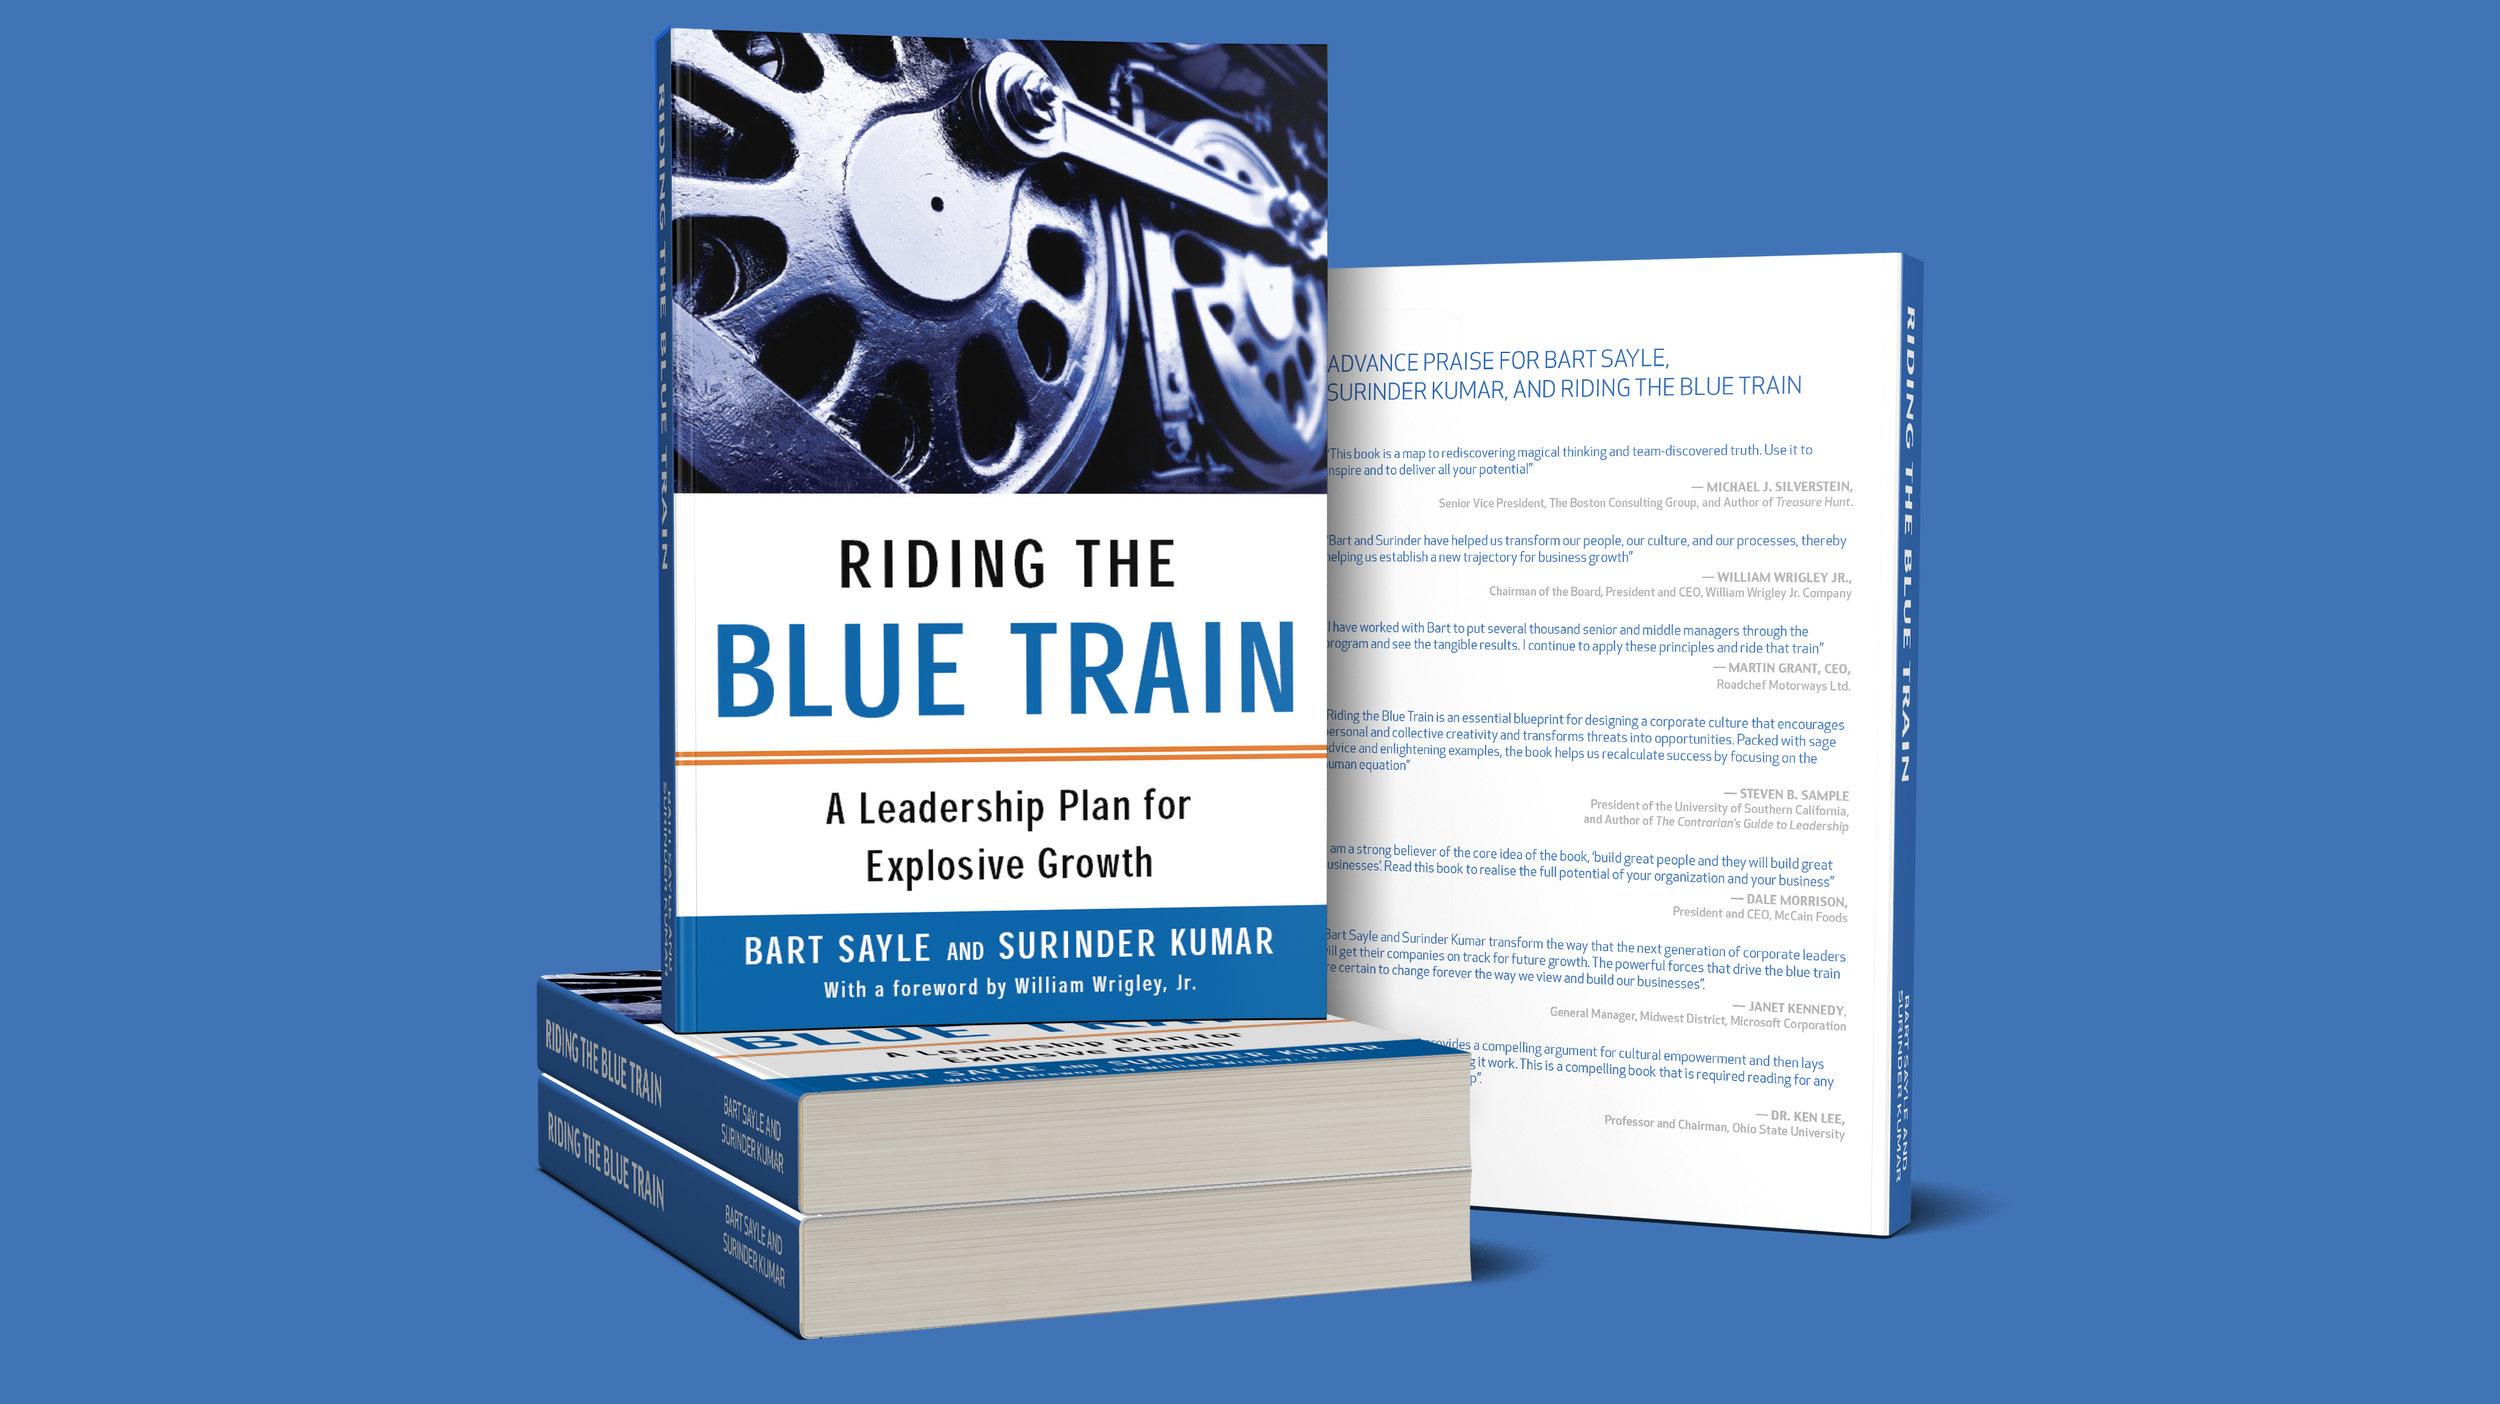 Riding_the_blue_train_cover.jpg